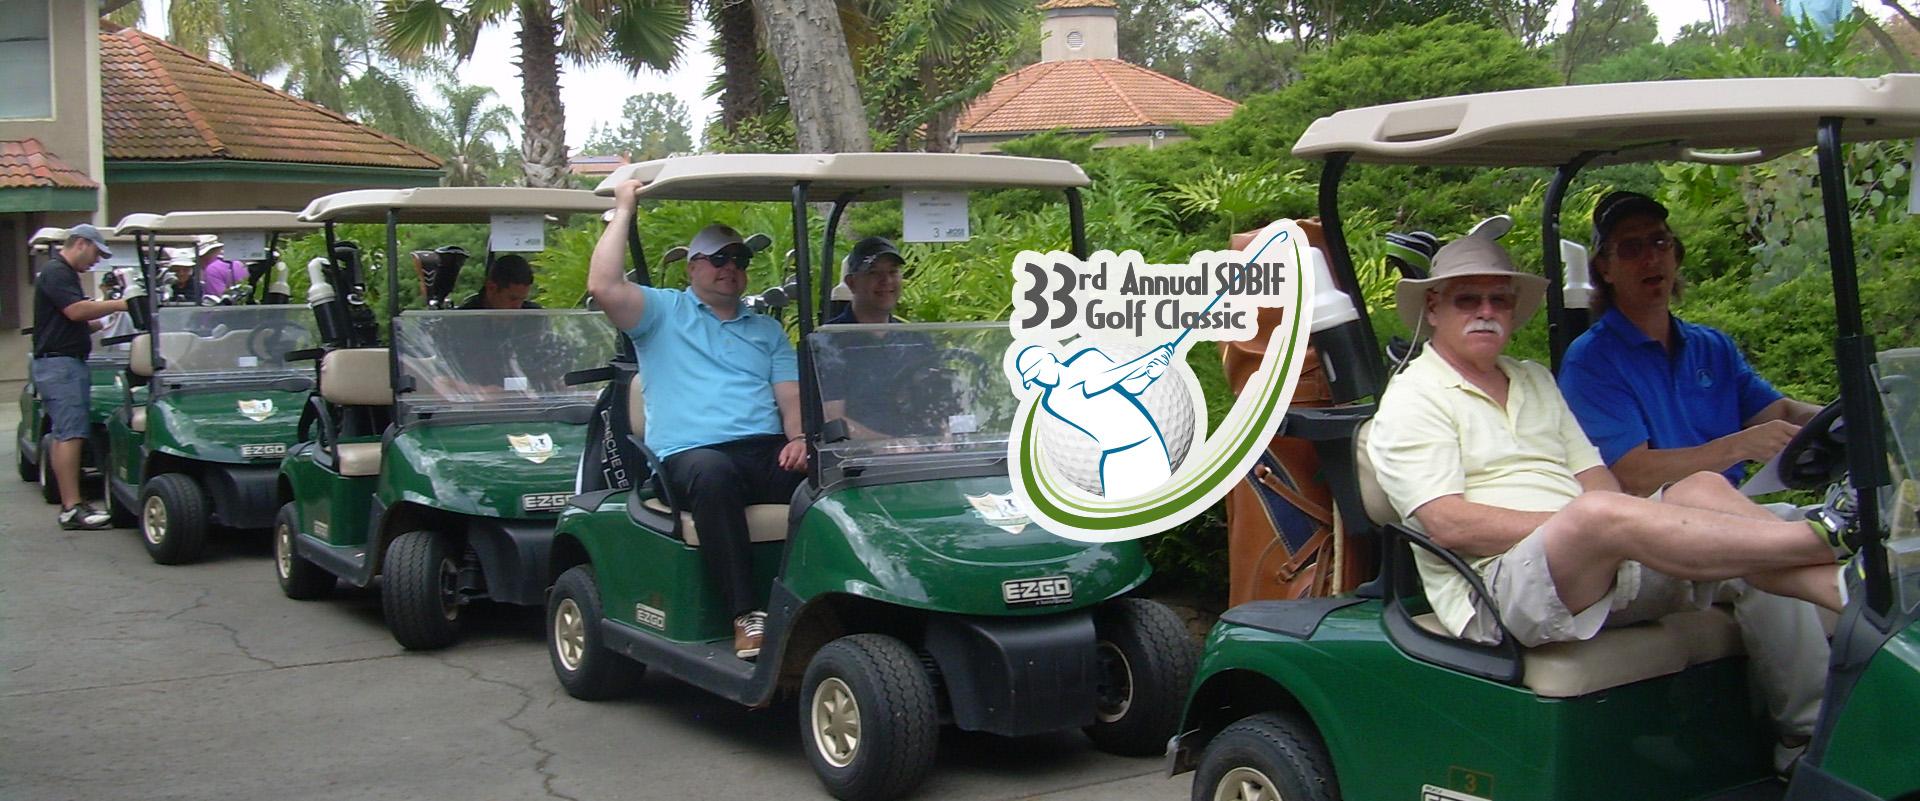 2018 SDBIF Charity Golf Classic